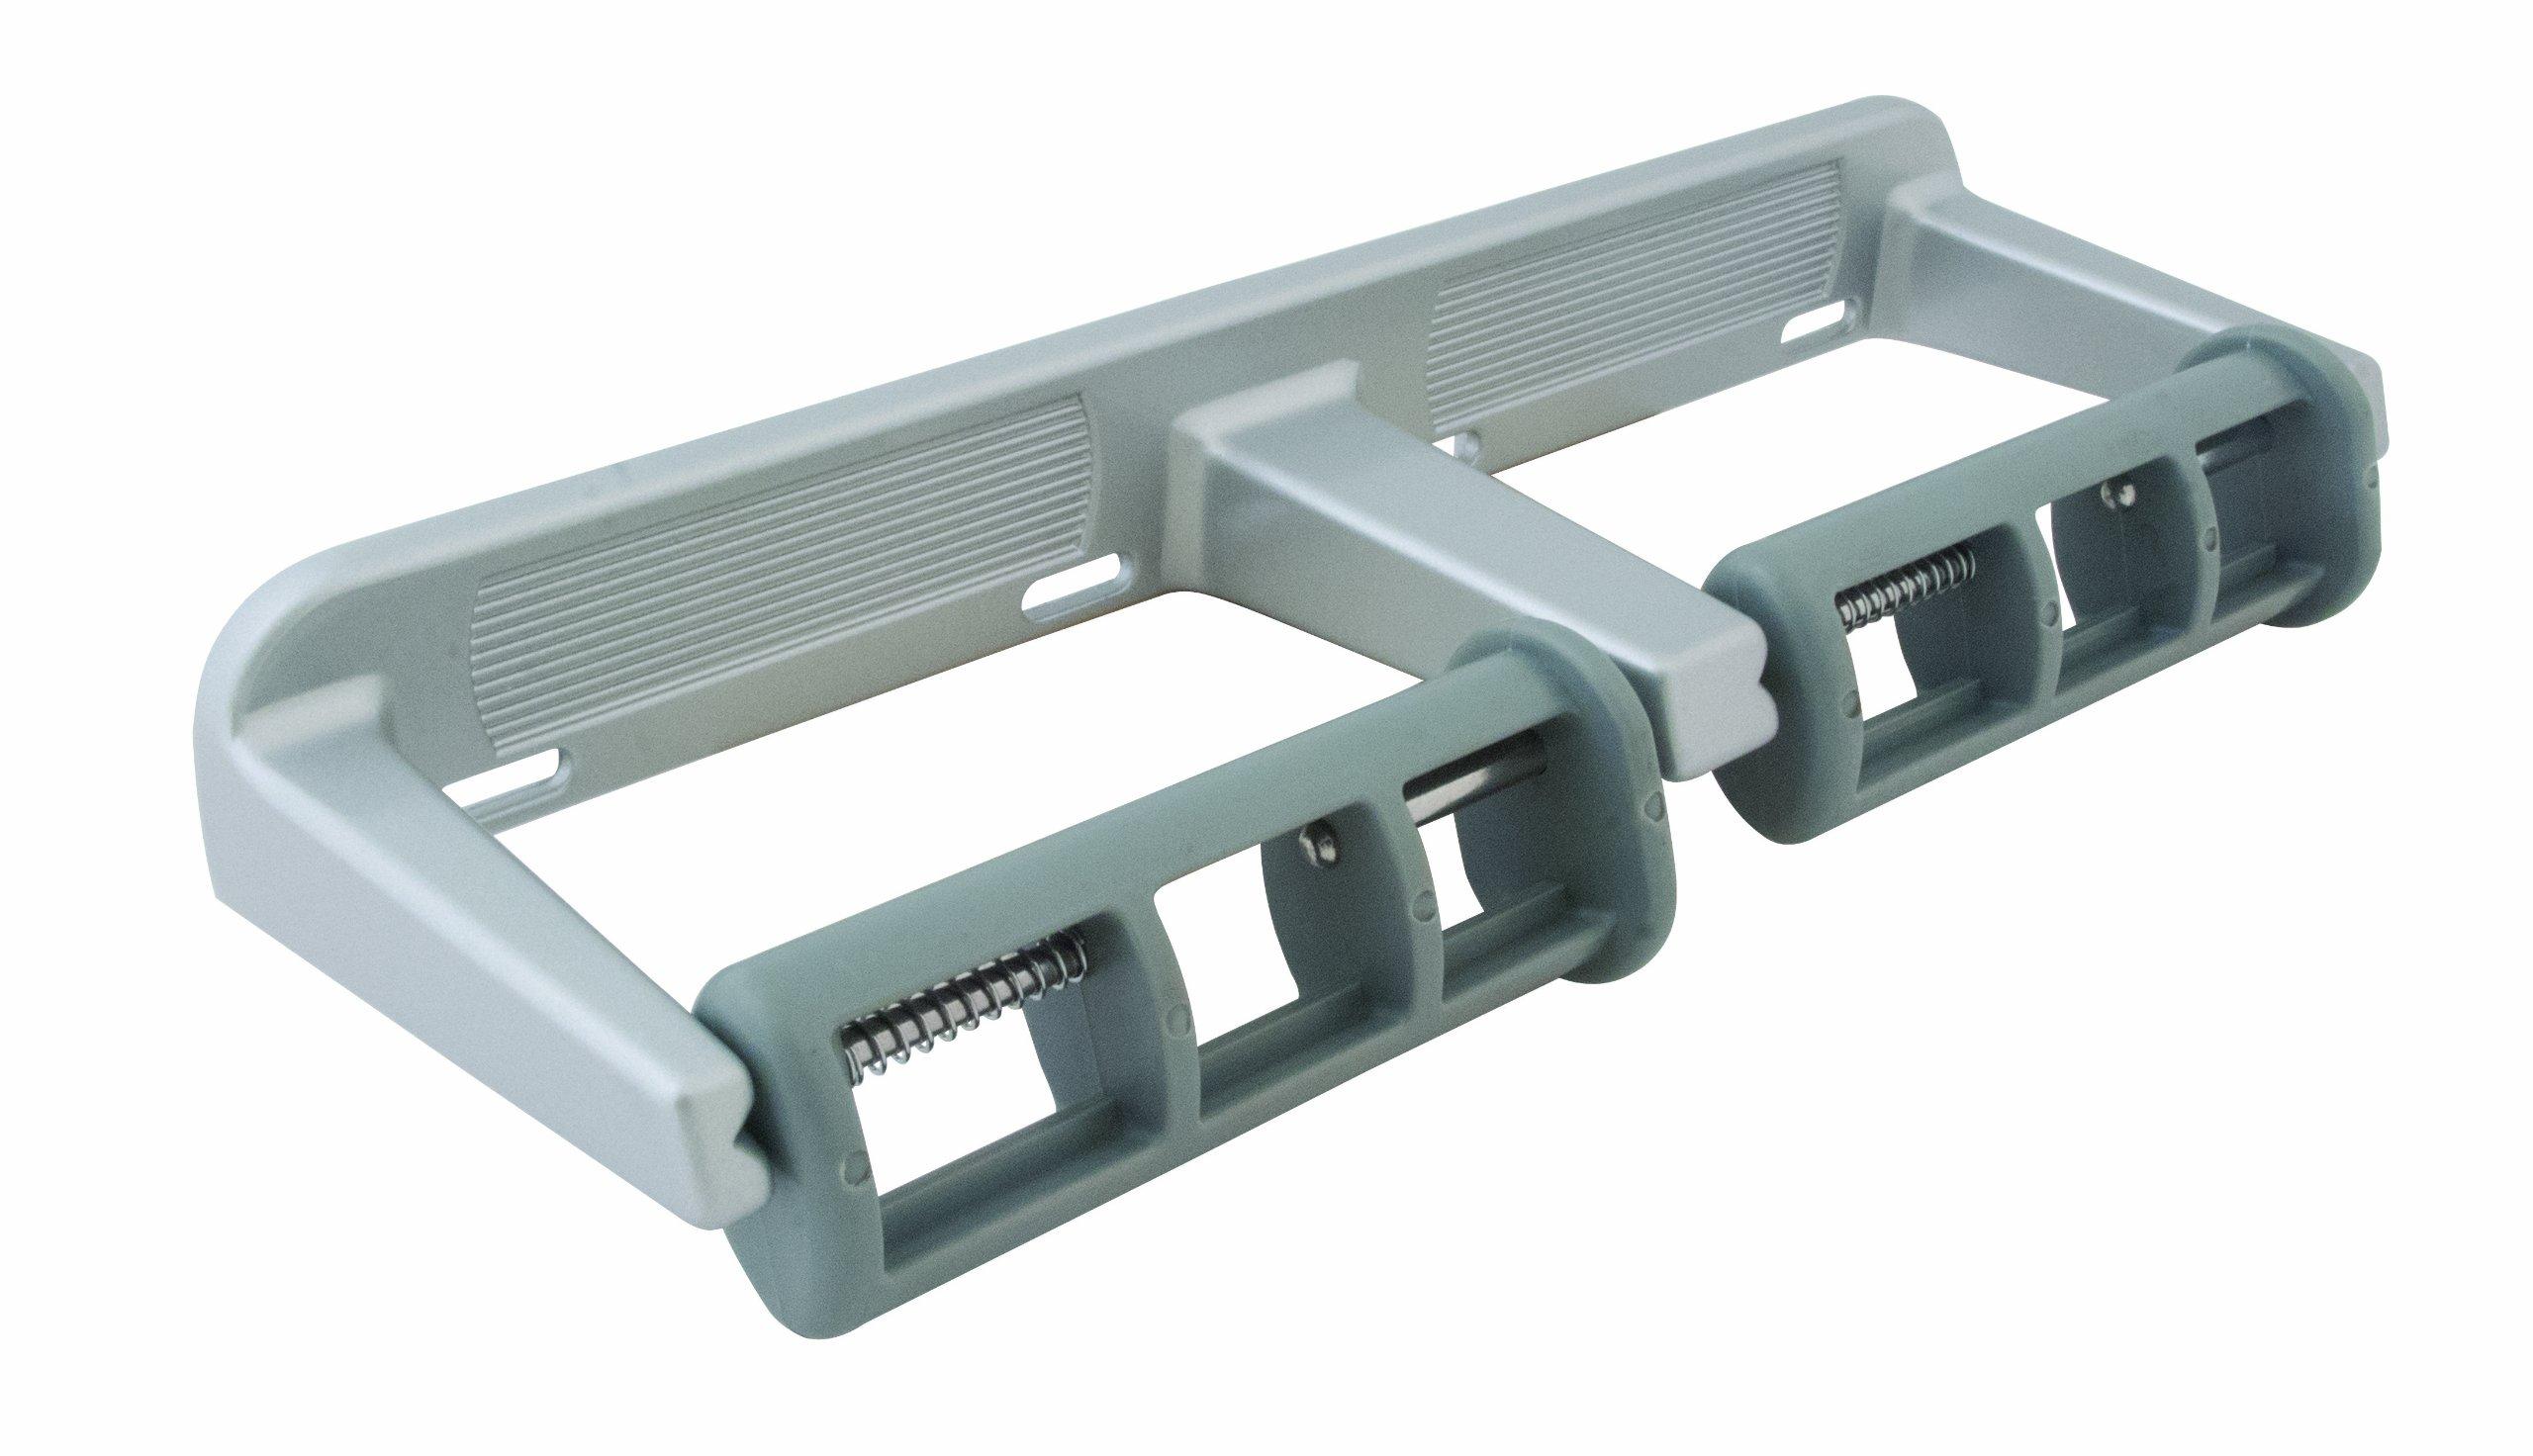 Bradley 5241-500000 Rocking Control Dual Roll Toilet Tissue Dispenser, 13'' Width x 1-3/4'' Height x 4-1/4'' Depth